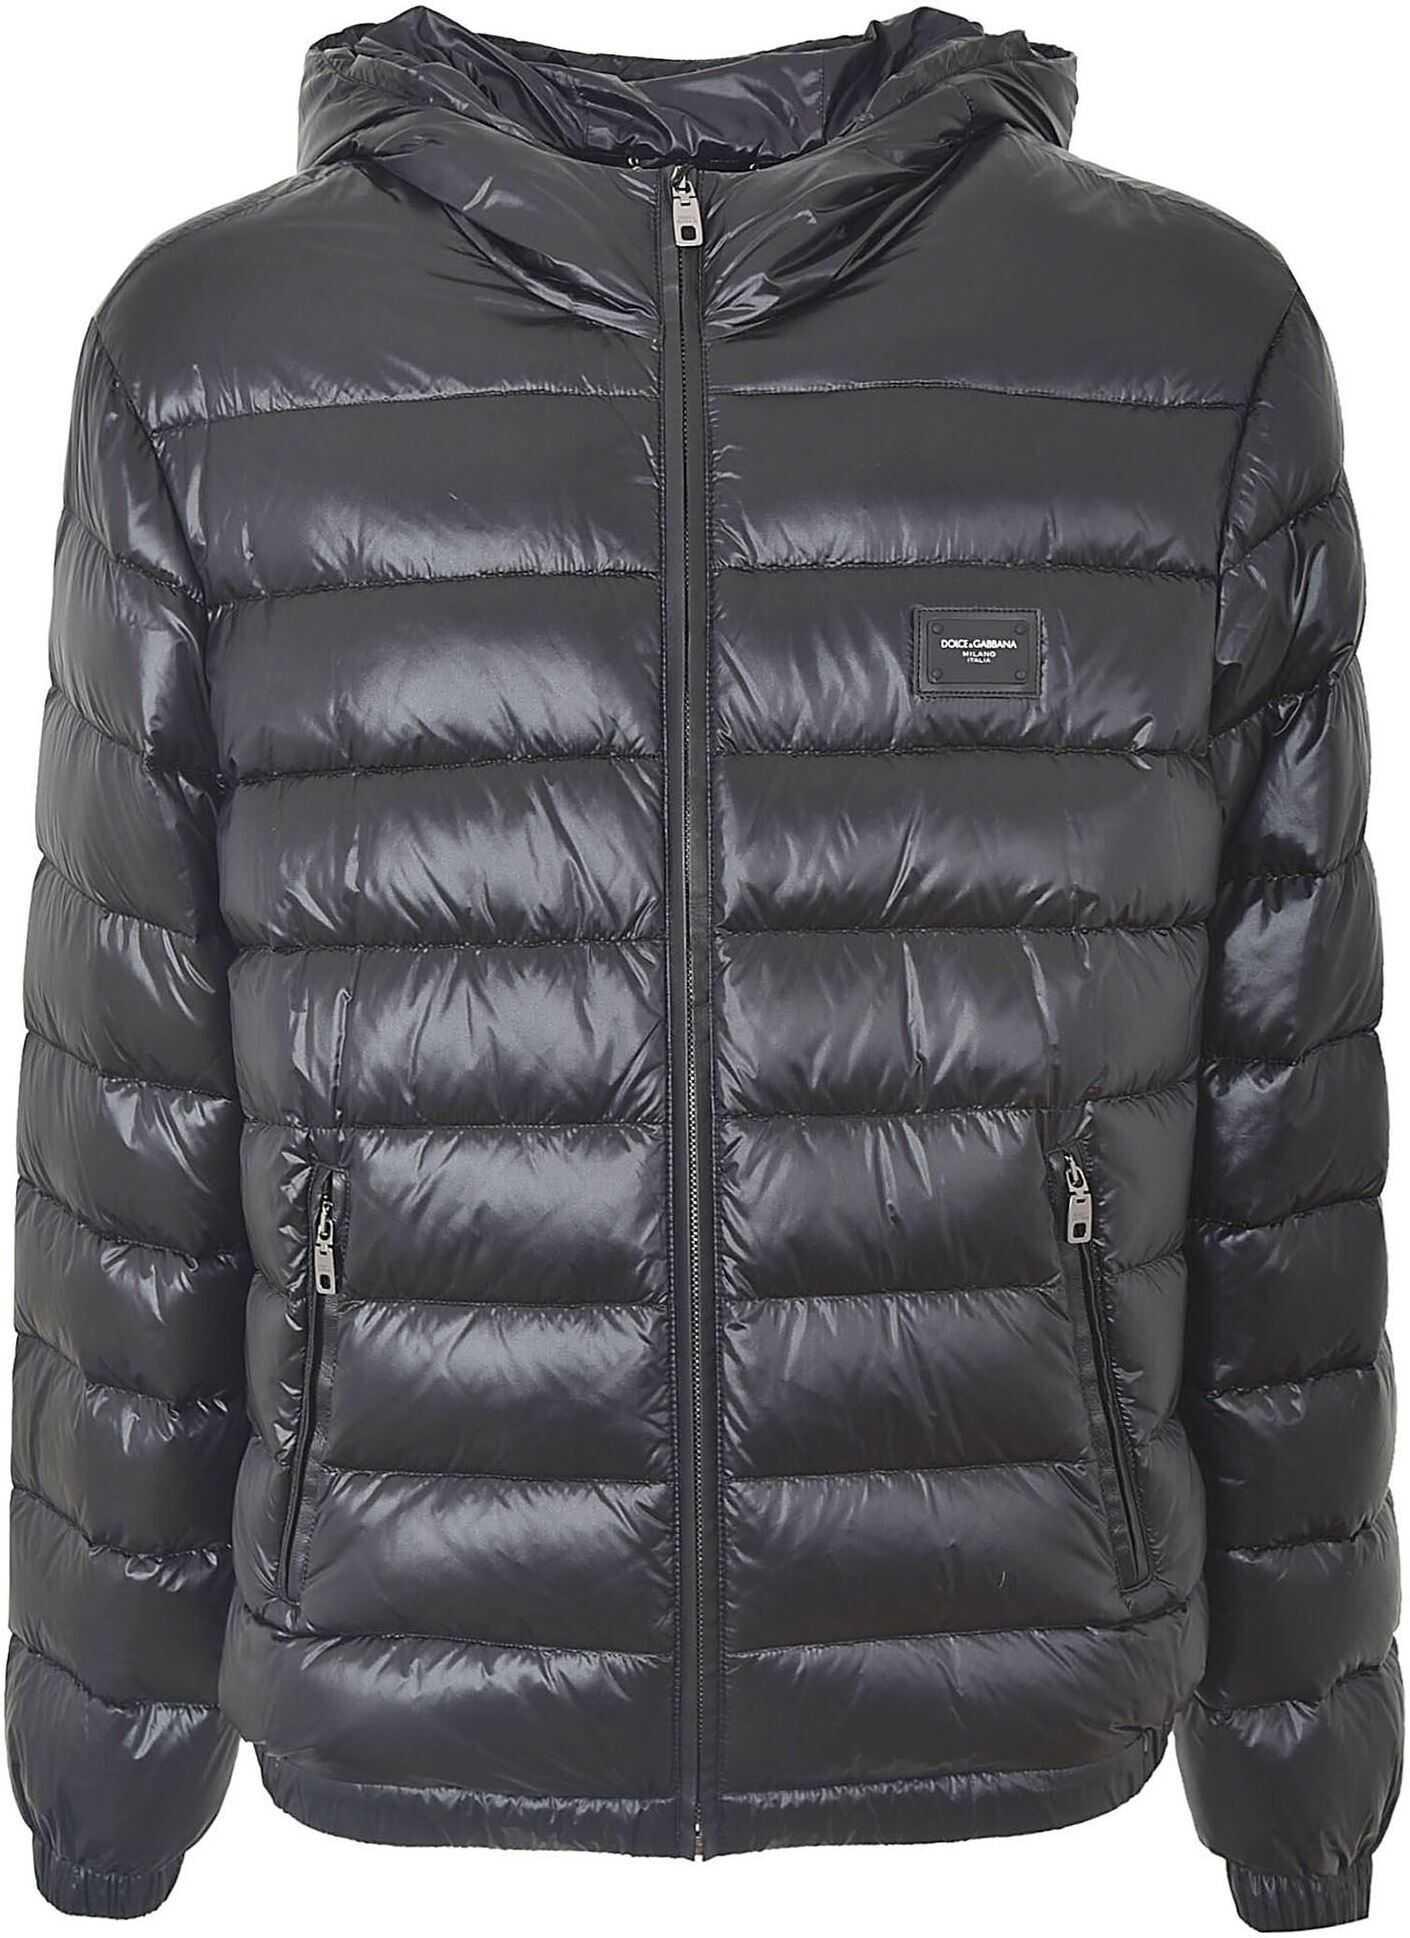 Dolce & Gabbana Hooded Down Jacket In Black Black imagine